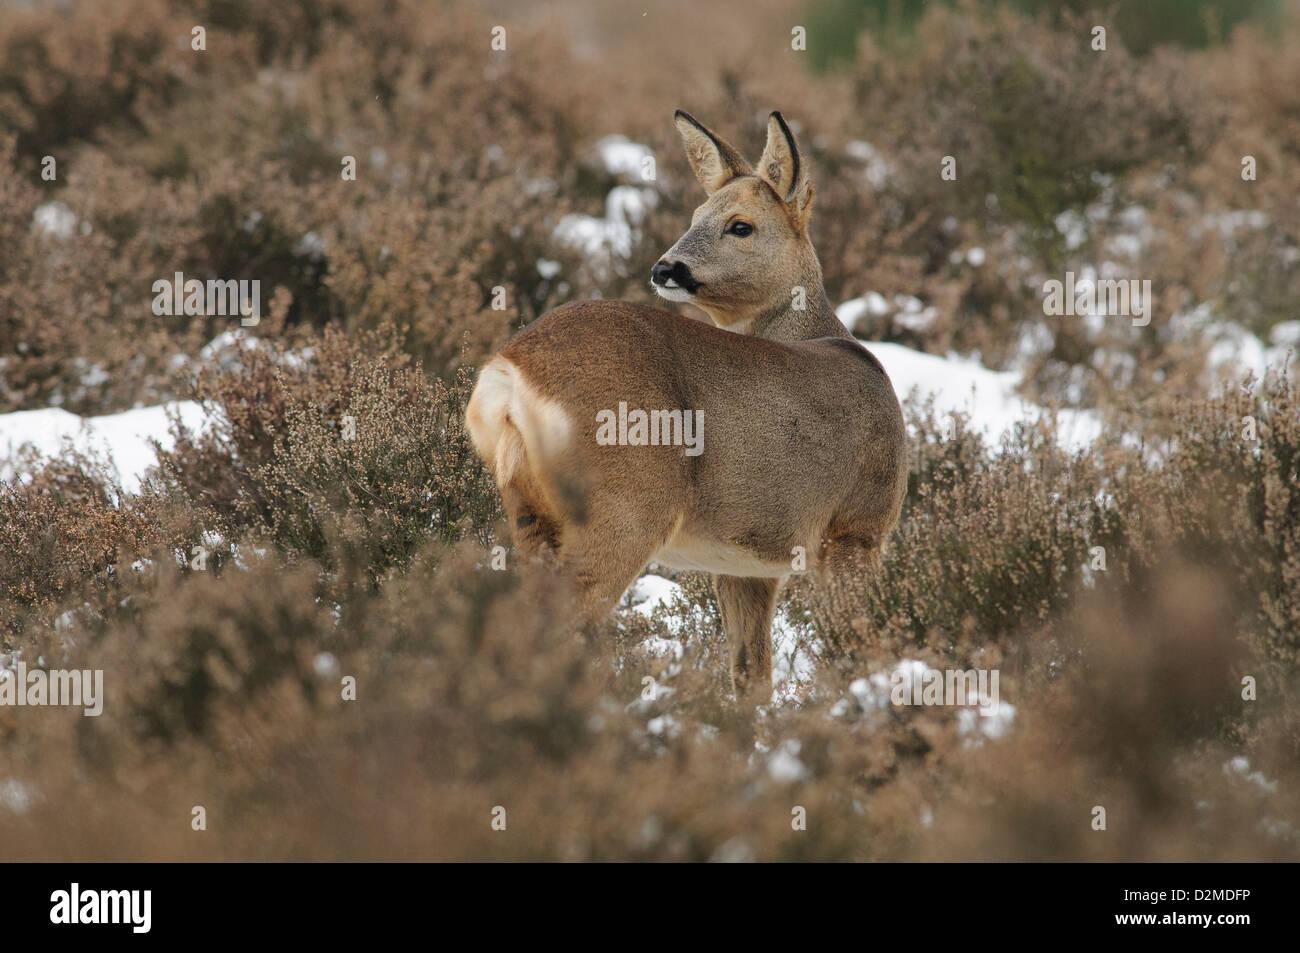 Roe deer in the snow - Stock Image